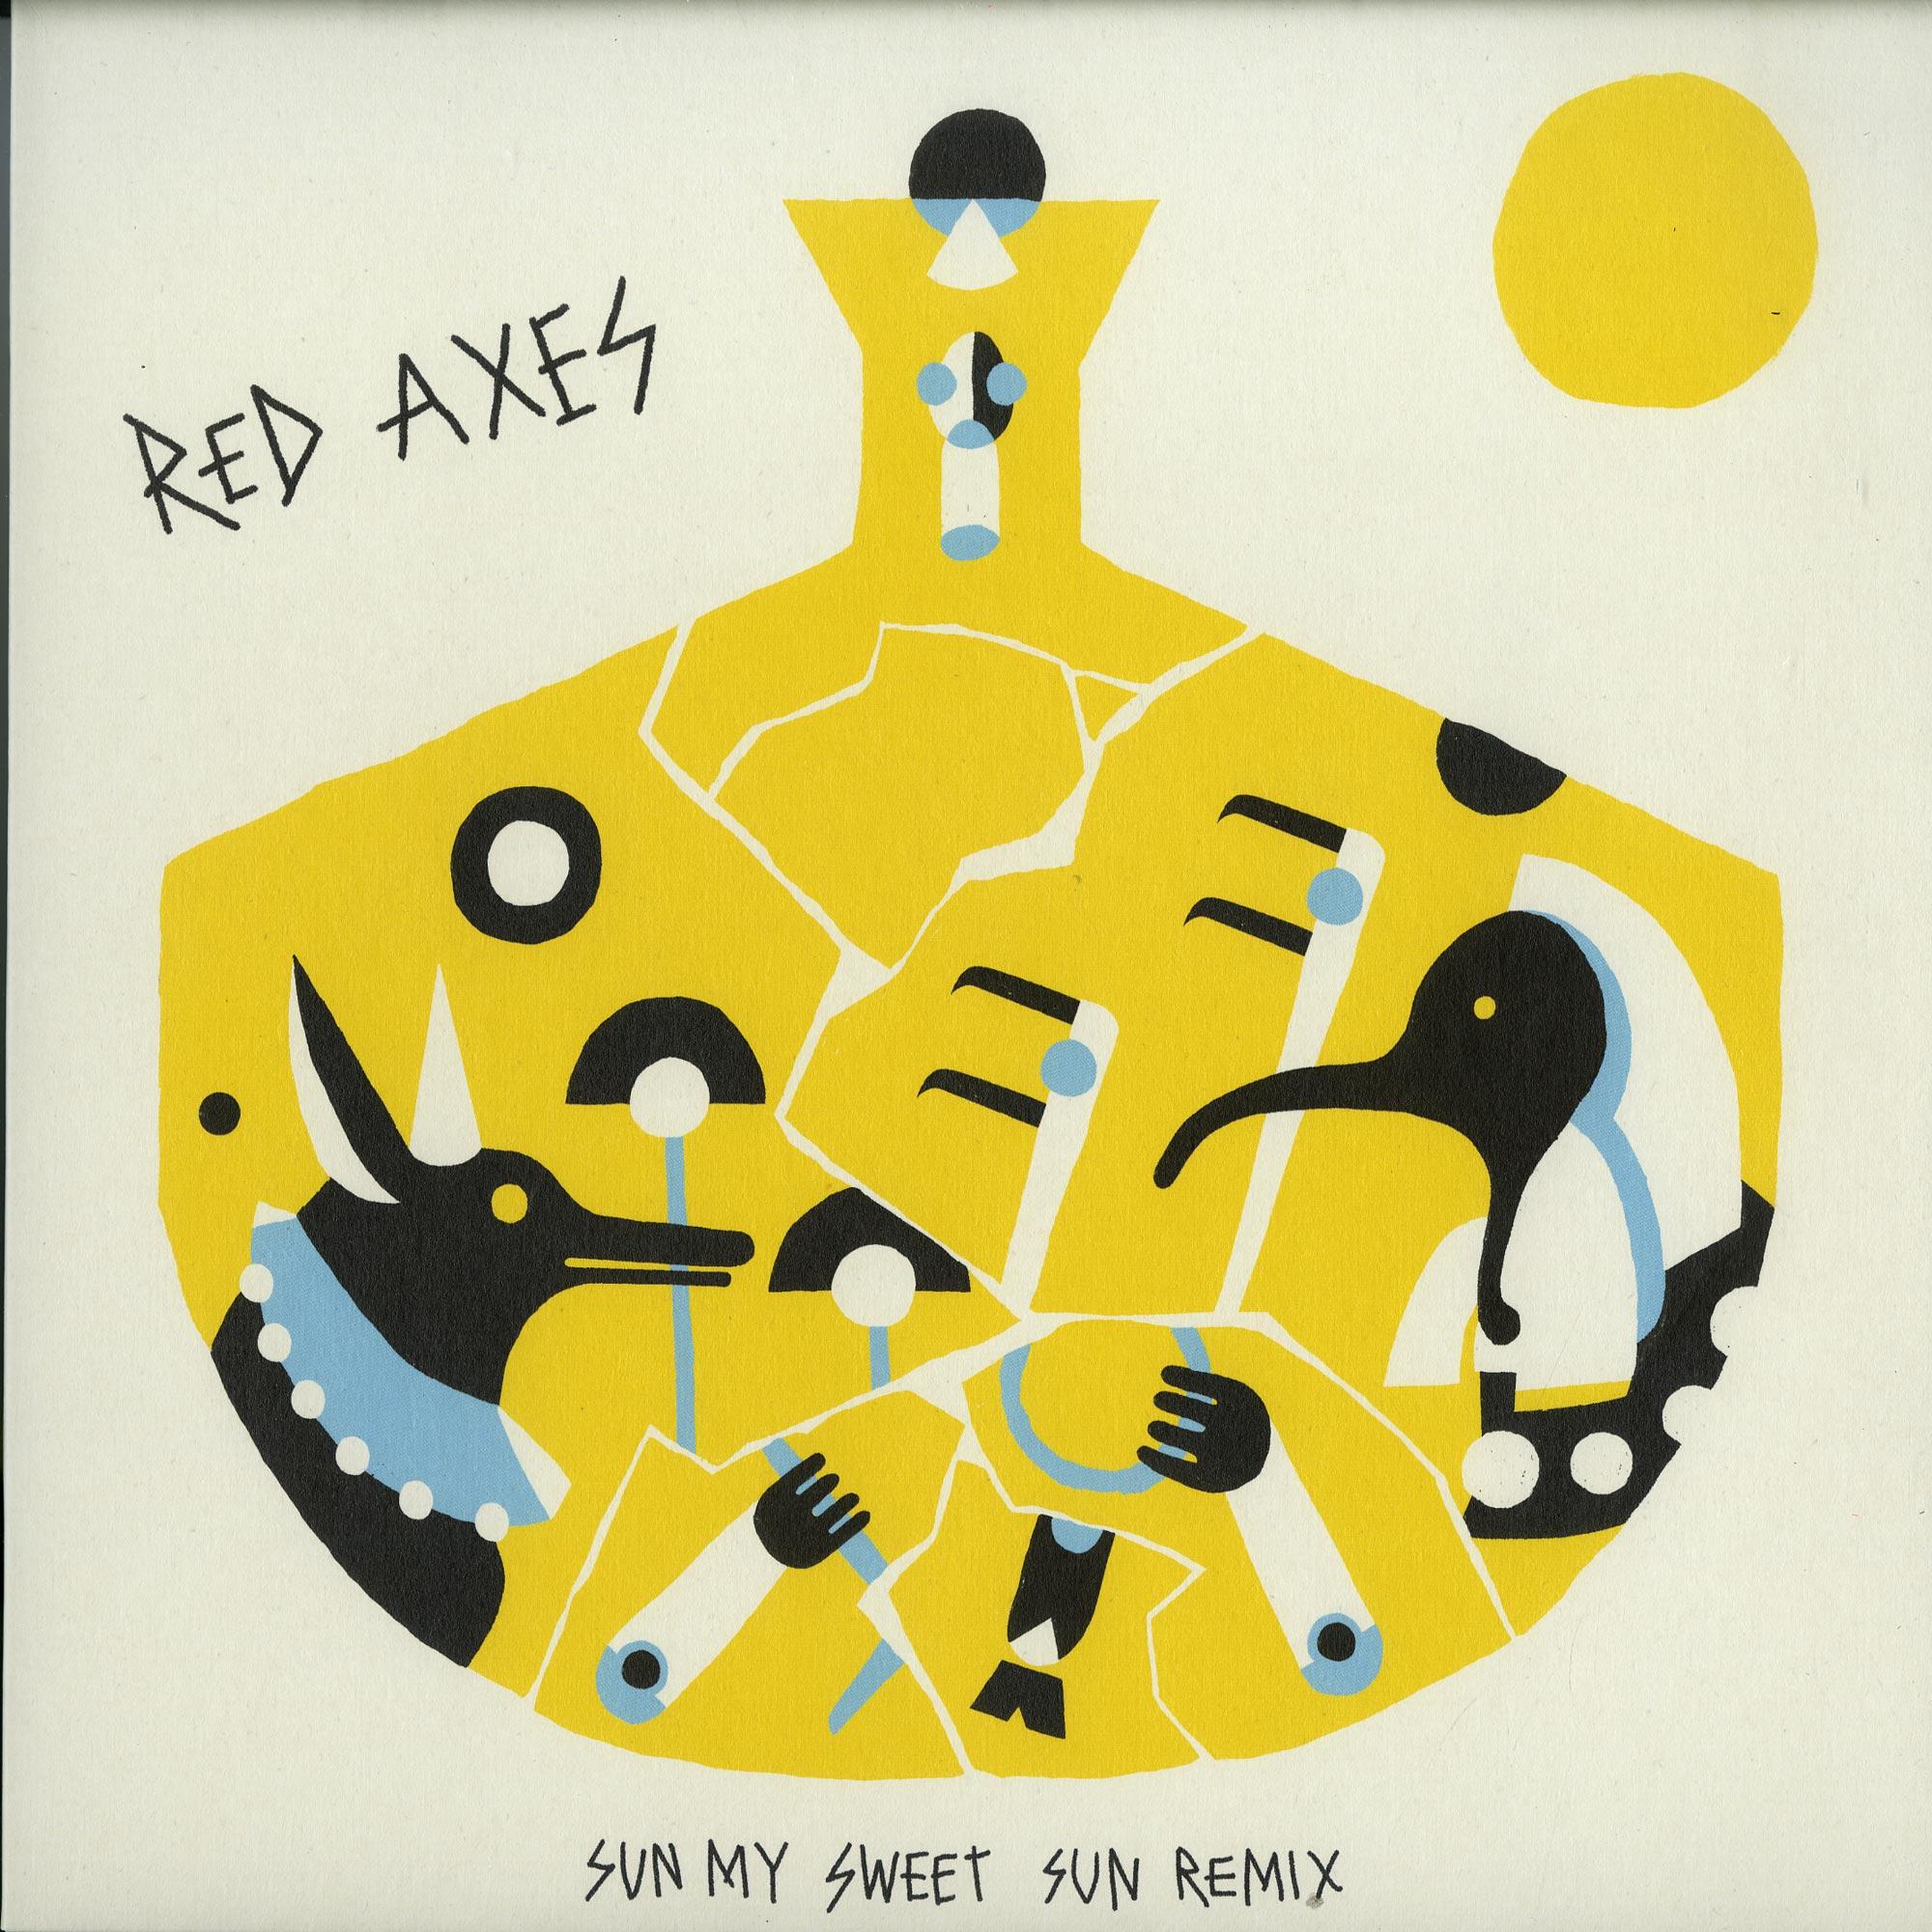 Red Axes - SUN MY SWEET SUN REMIX